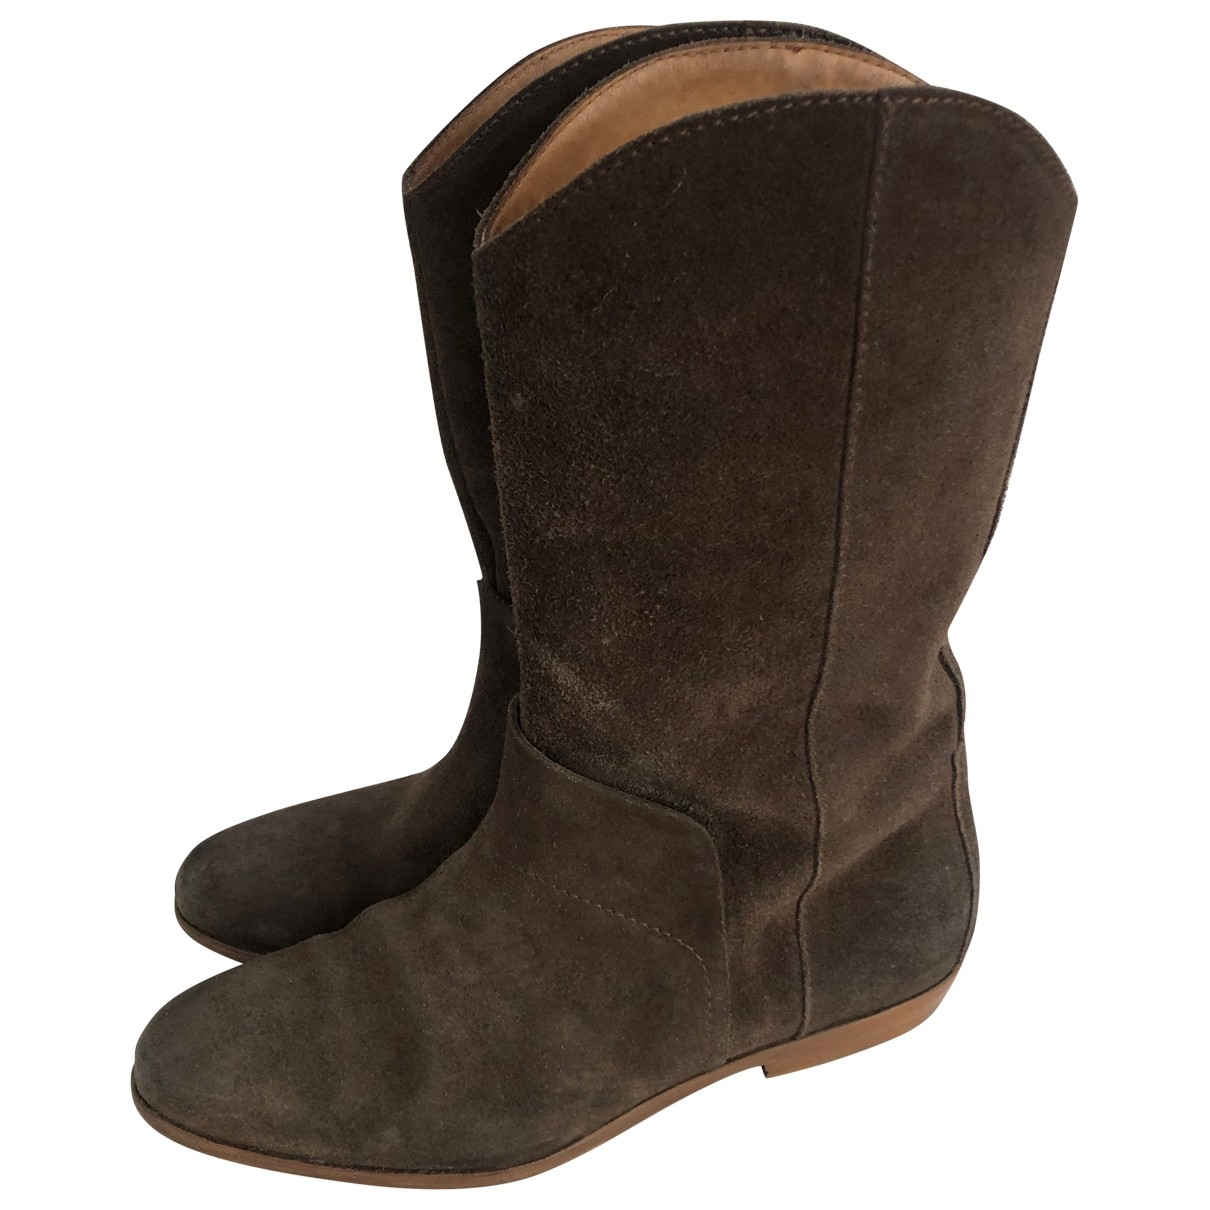 Maison Martin Margiela \N Brown Suede Boots for Women 39 EU